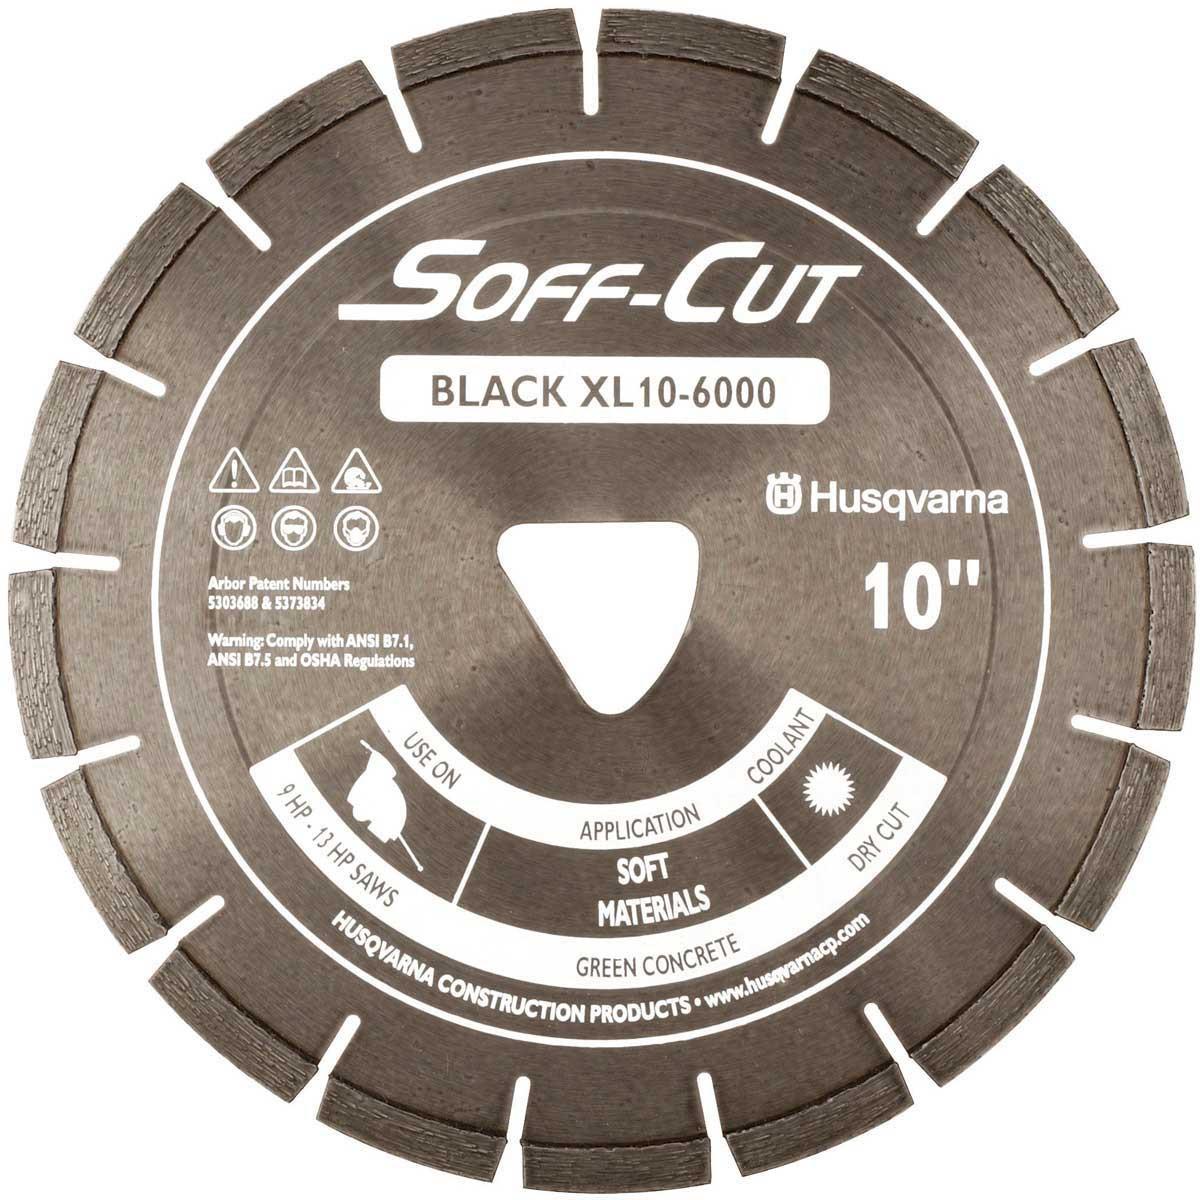 Husqvarna Soff-Cut Excel 6000 Black Ultra Early Saw Blade